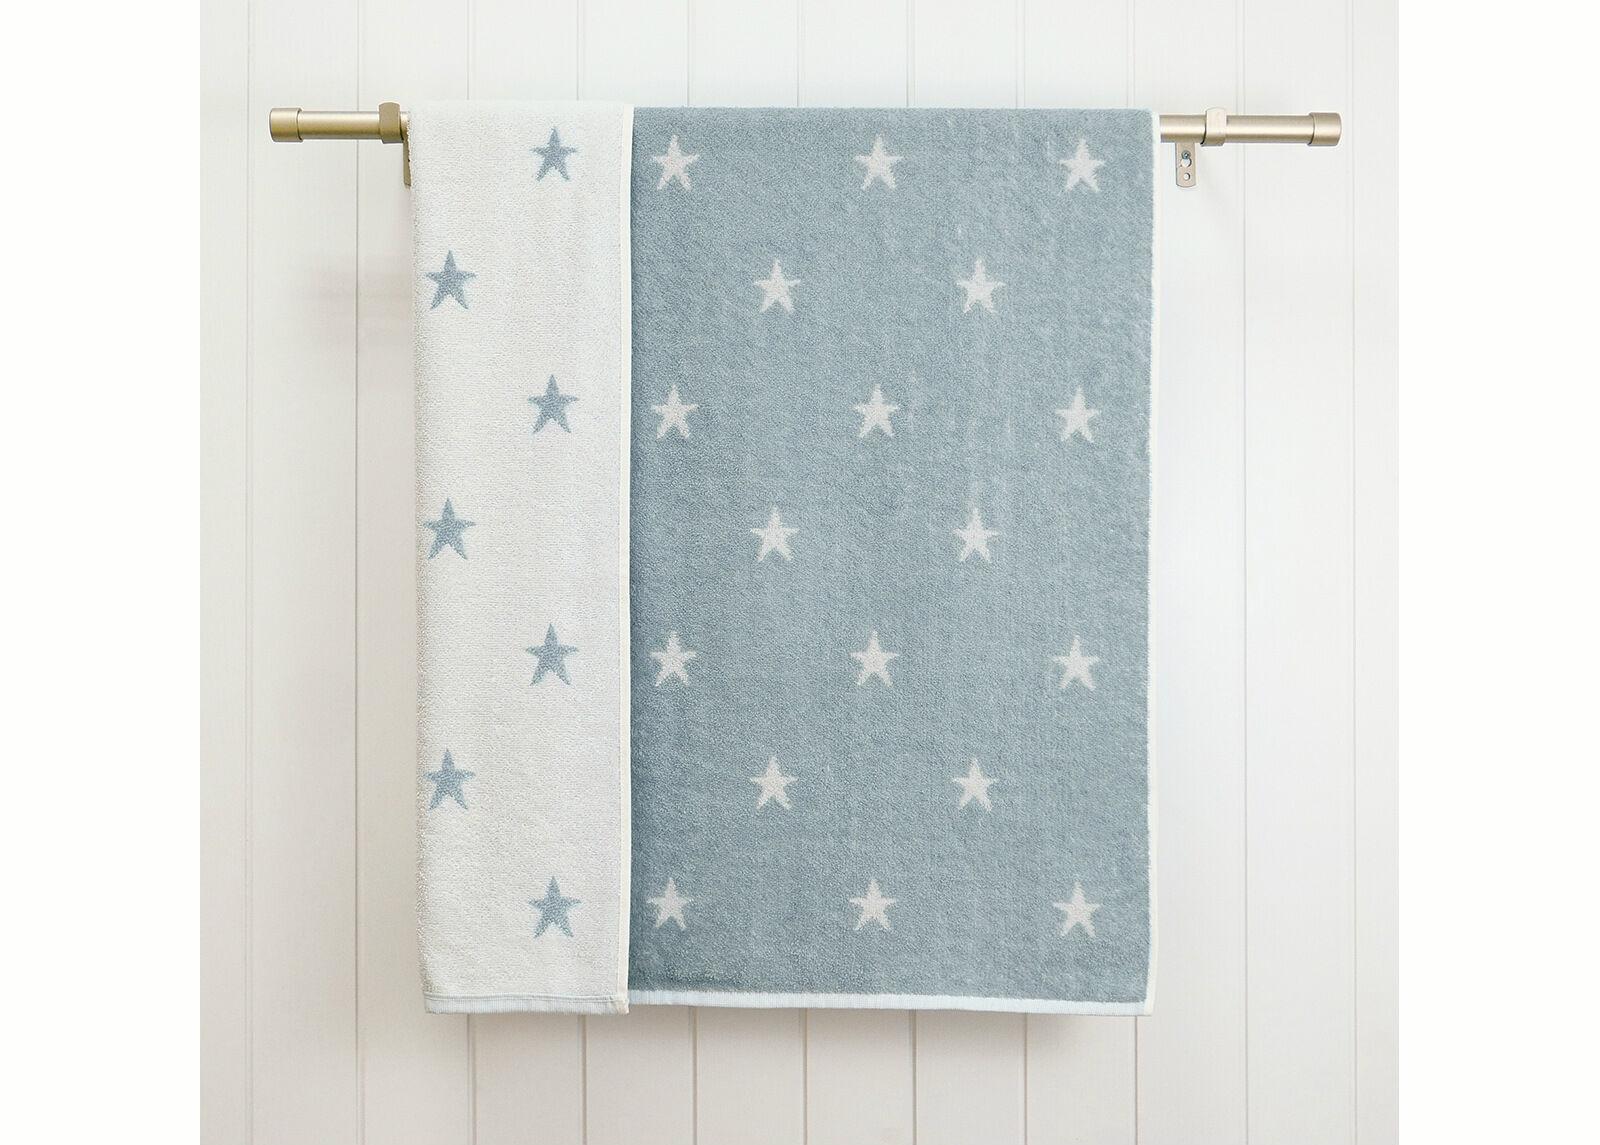 ARDENZA BABY Froteepyyhkeet Stars, 2 kpl jeans